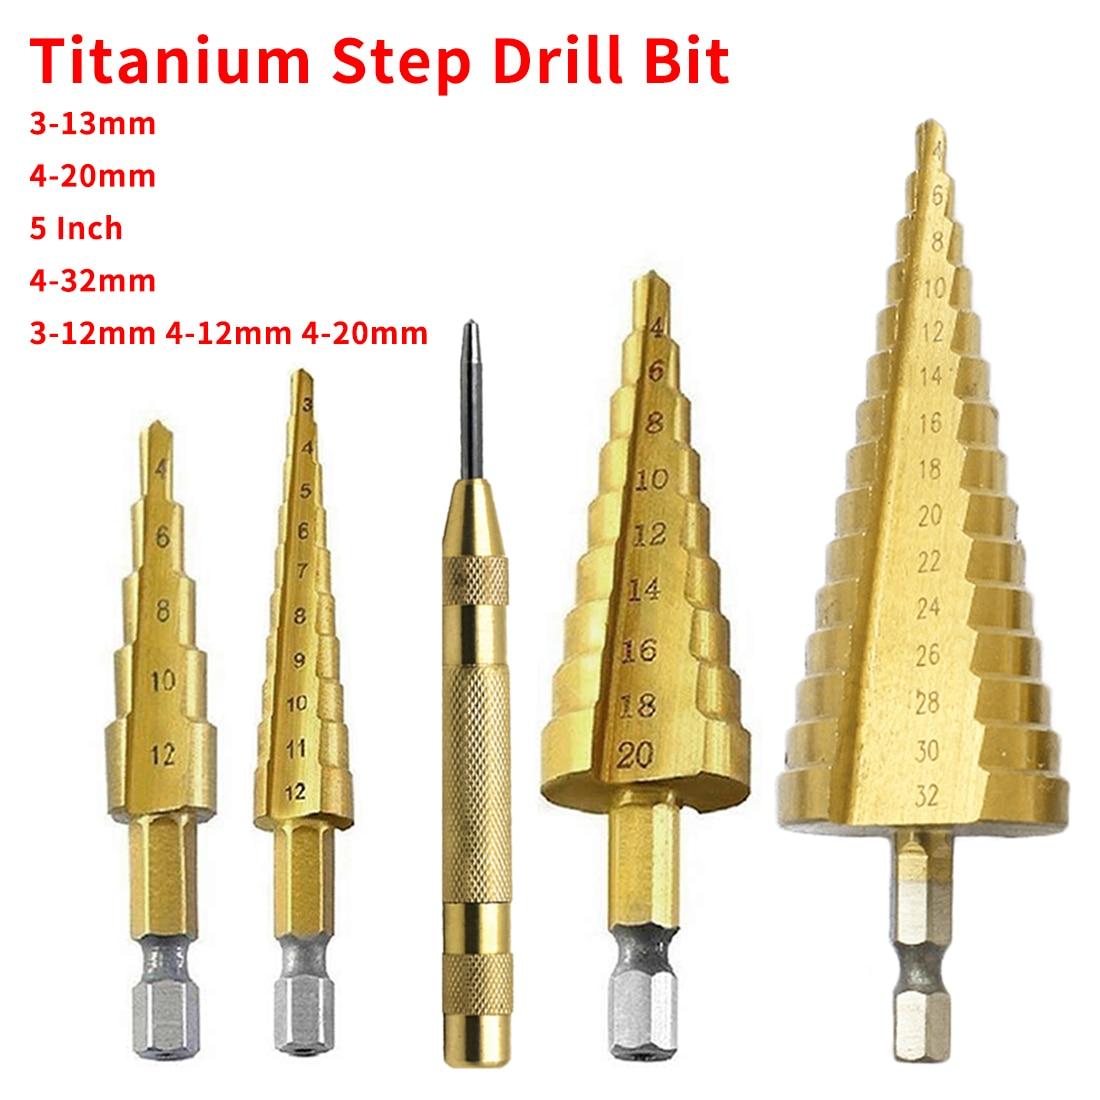 HOT SALE Large HSS Step Cone Drill Titanium Bit Set Hole Metal Cutter 4-20mm